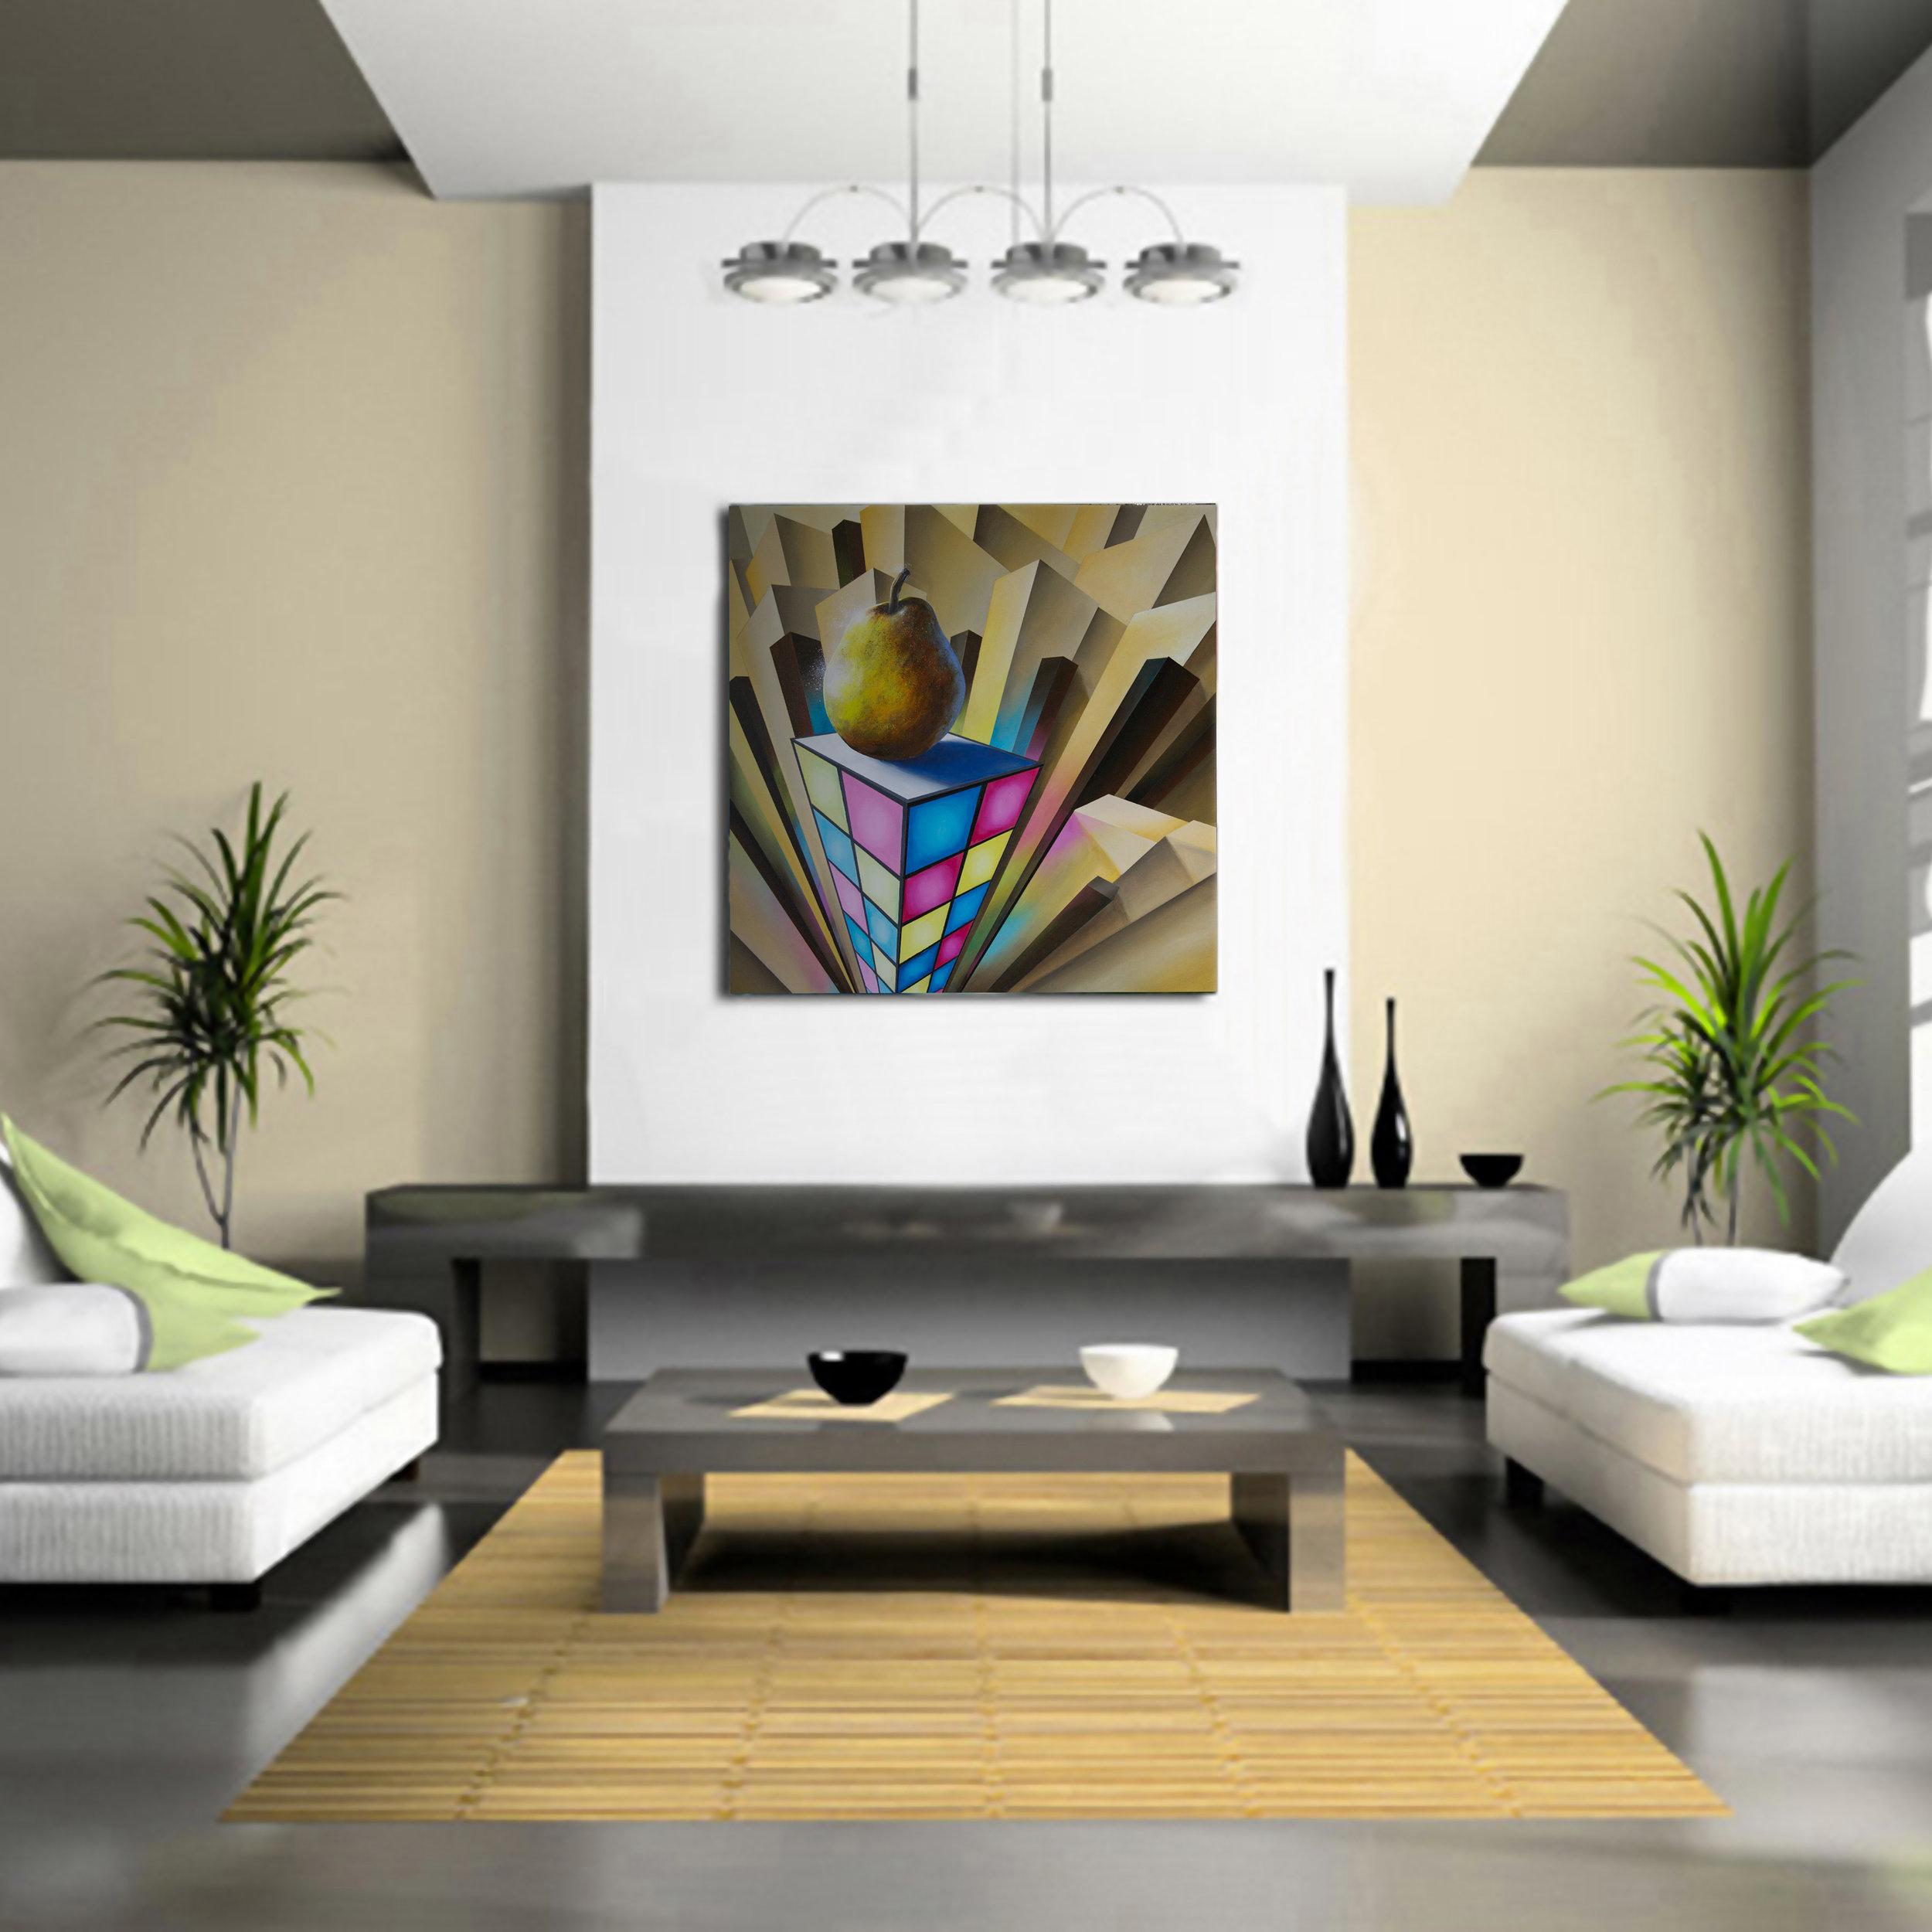 interior-design-artwork-on-wallinterior-design-artwork-on-wall-flair-bill-higginson.jpg